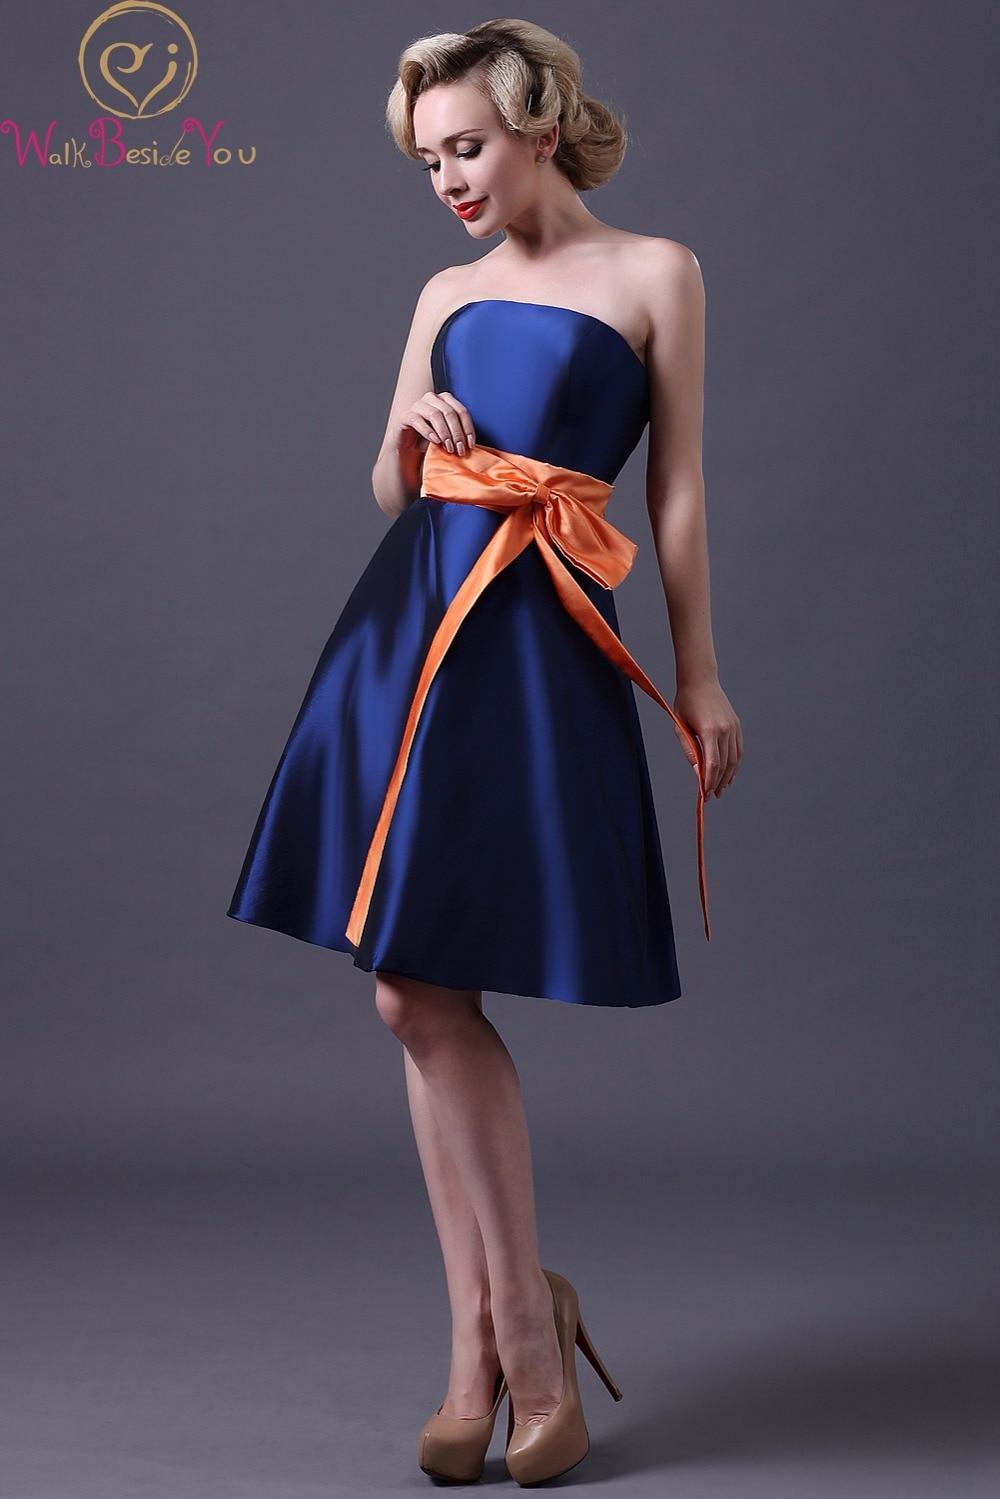 Miedoso Damas De Honor Azul Vestidos De Reino Unido Ideas Ornamento ...